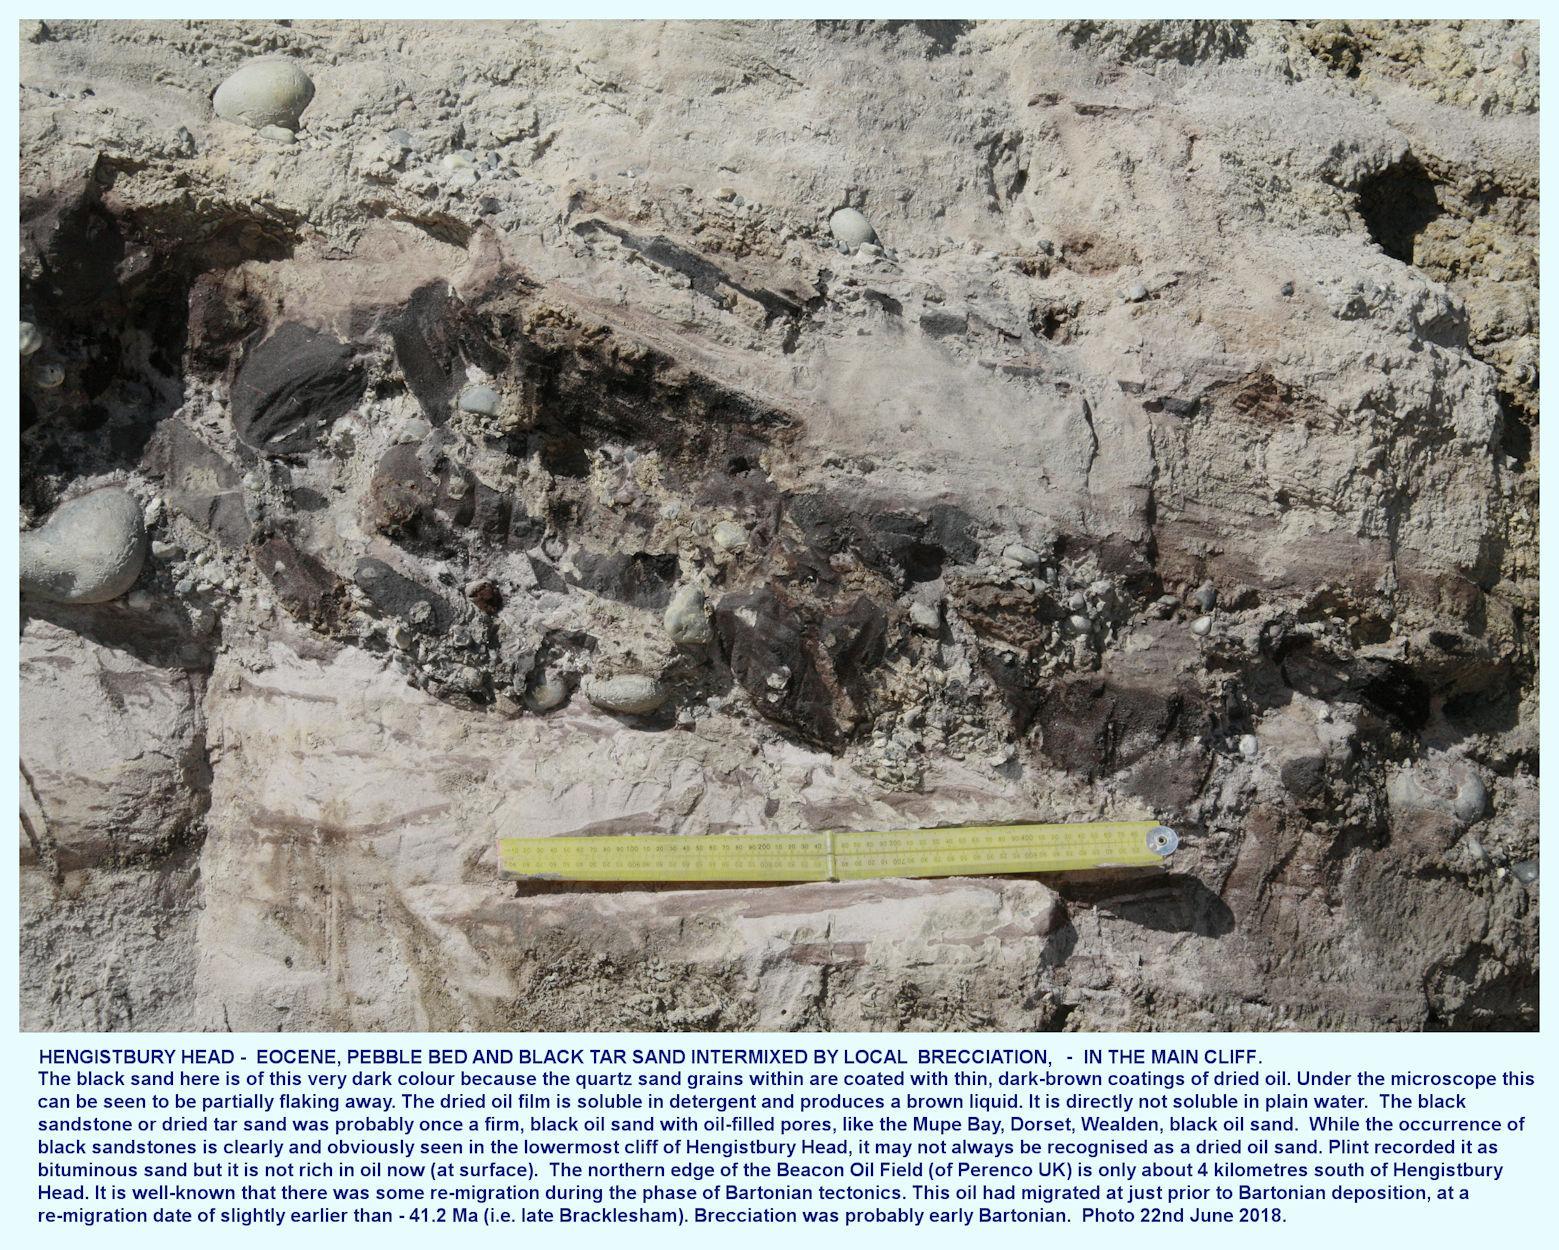 Brecciated black, bituminous sand and an overlying pebble bed, Eocene, at Hengistbury Head, Bournemouth, Dorset, November 2018, effects of an Eocene earthquake